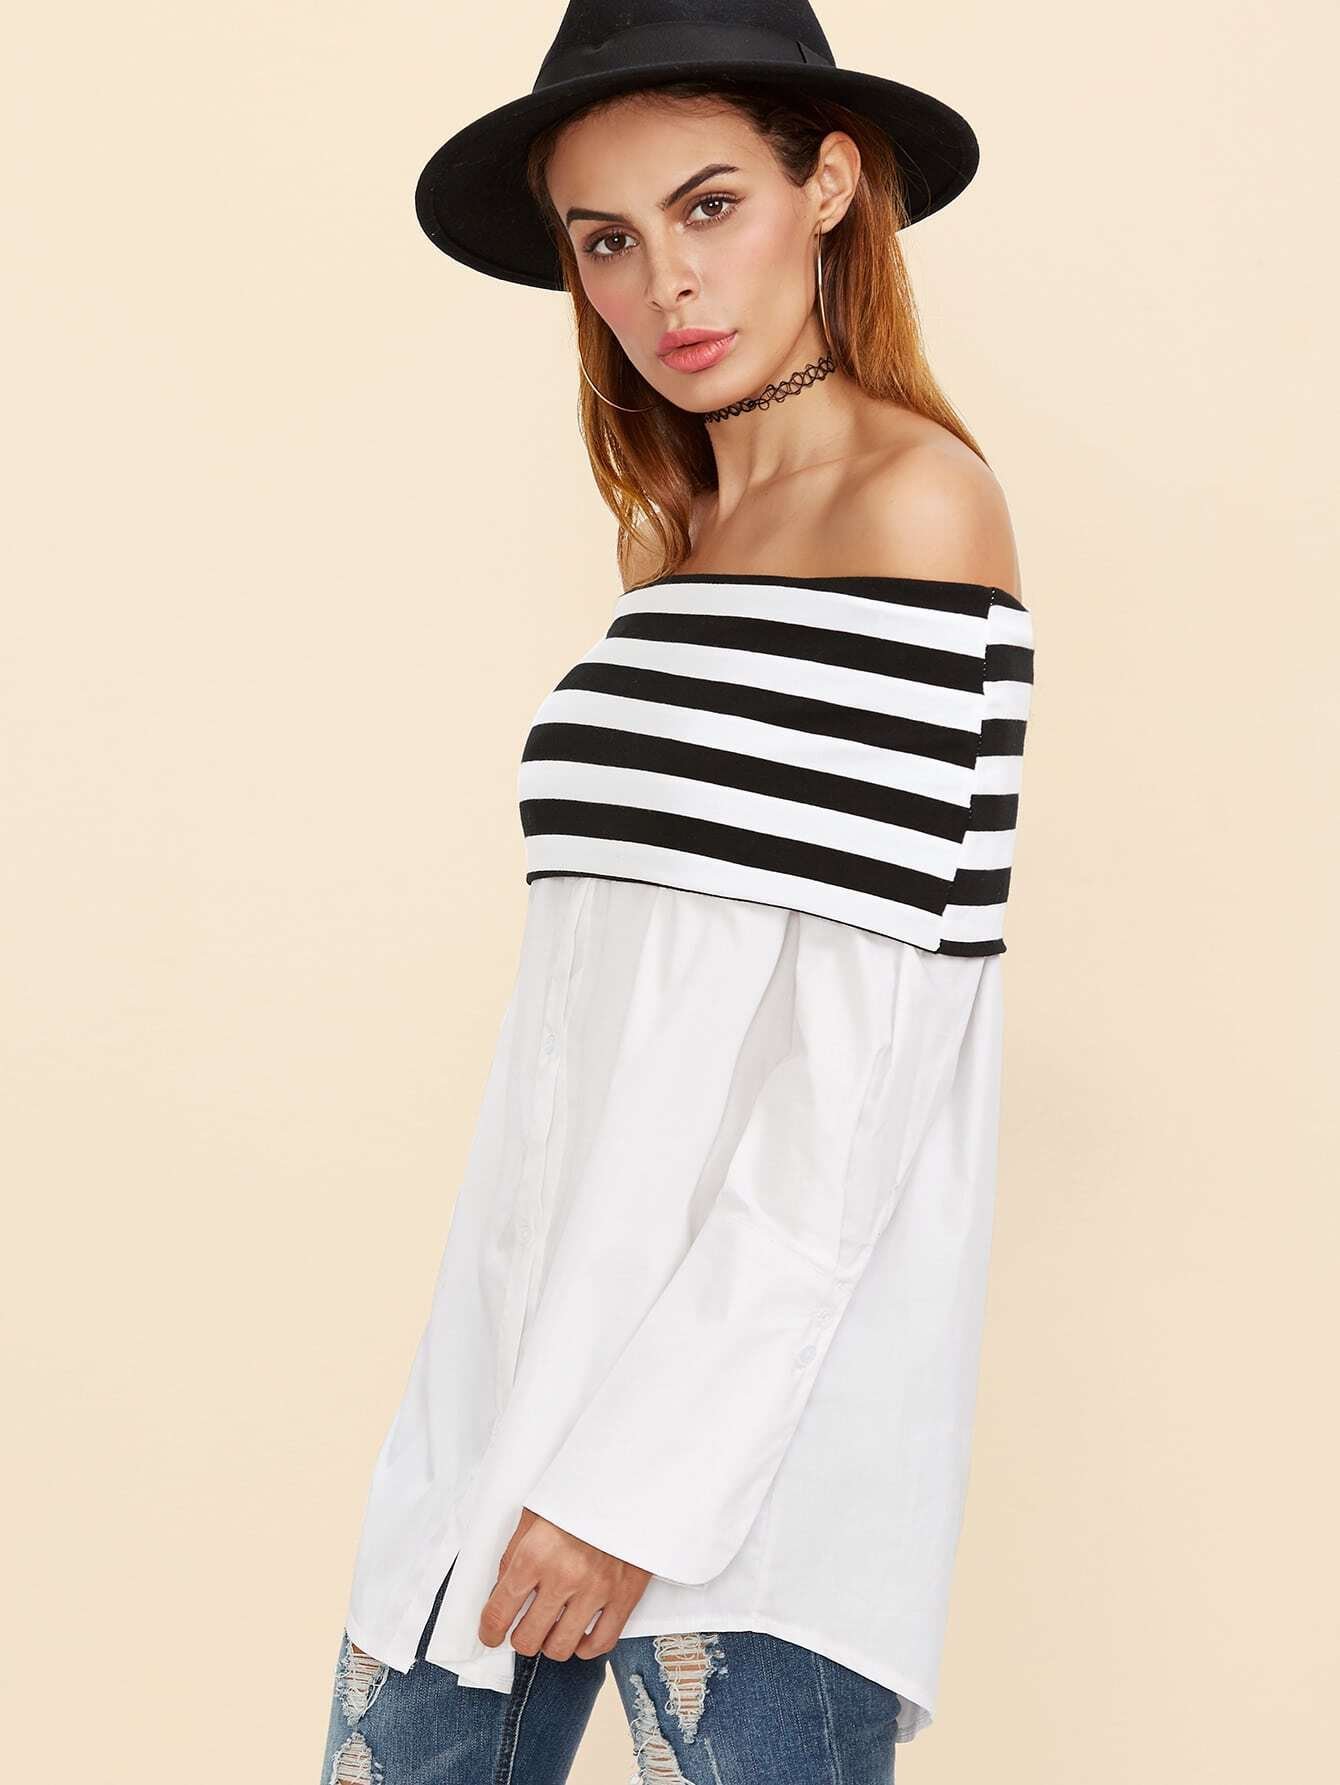 blouse161103450_2